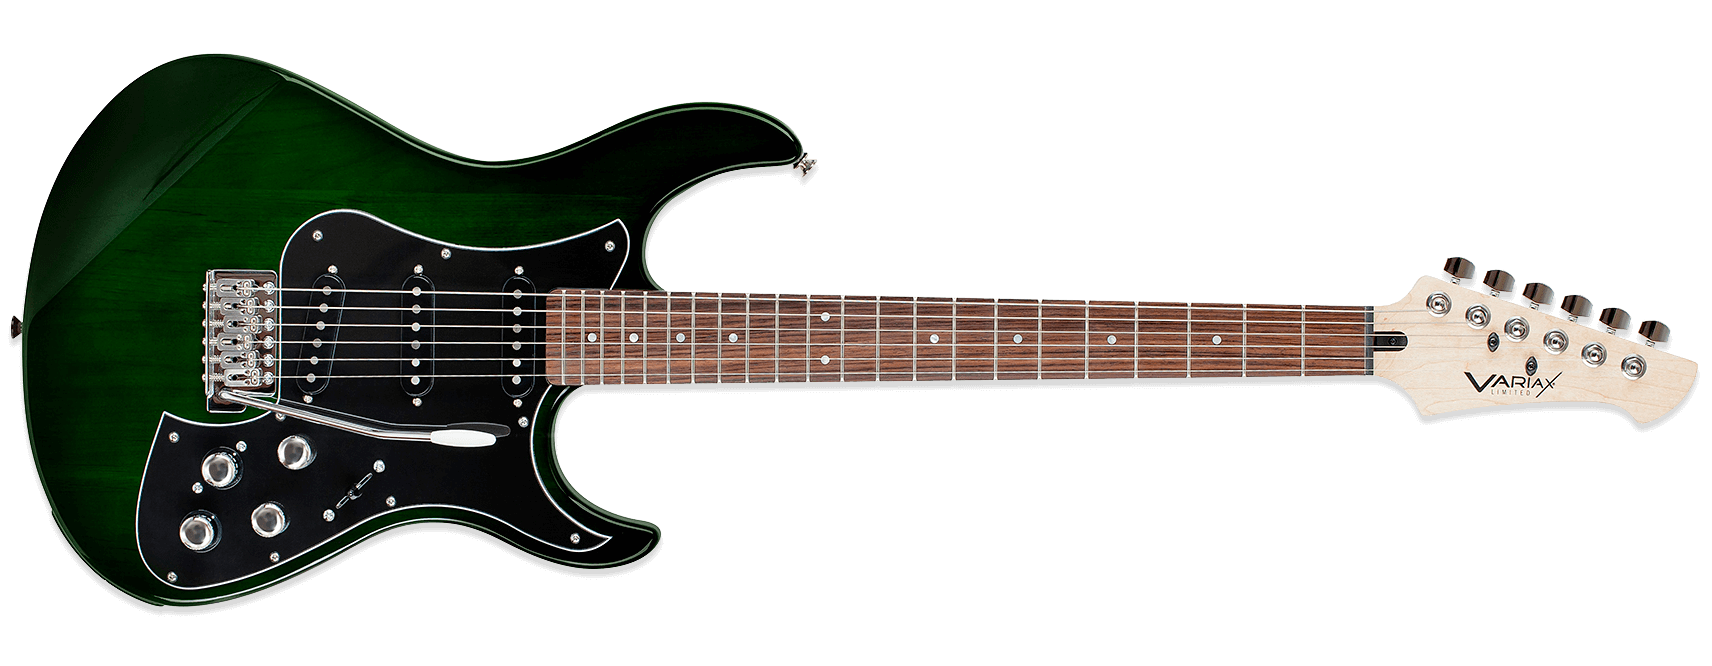 Line 6 Variax Standard Emerald